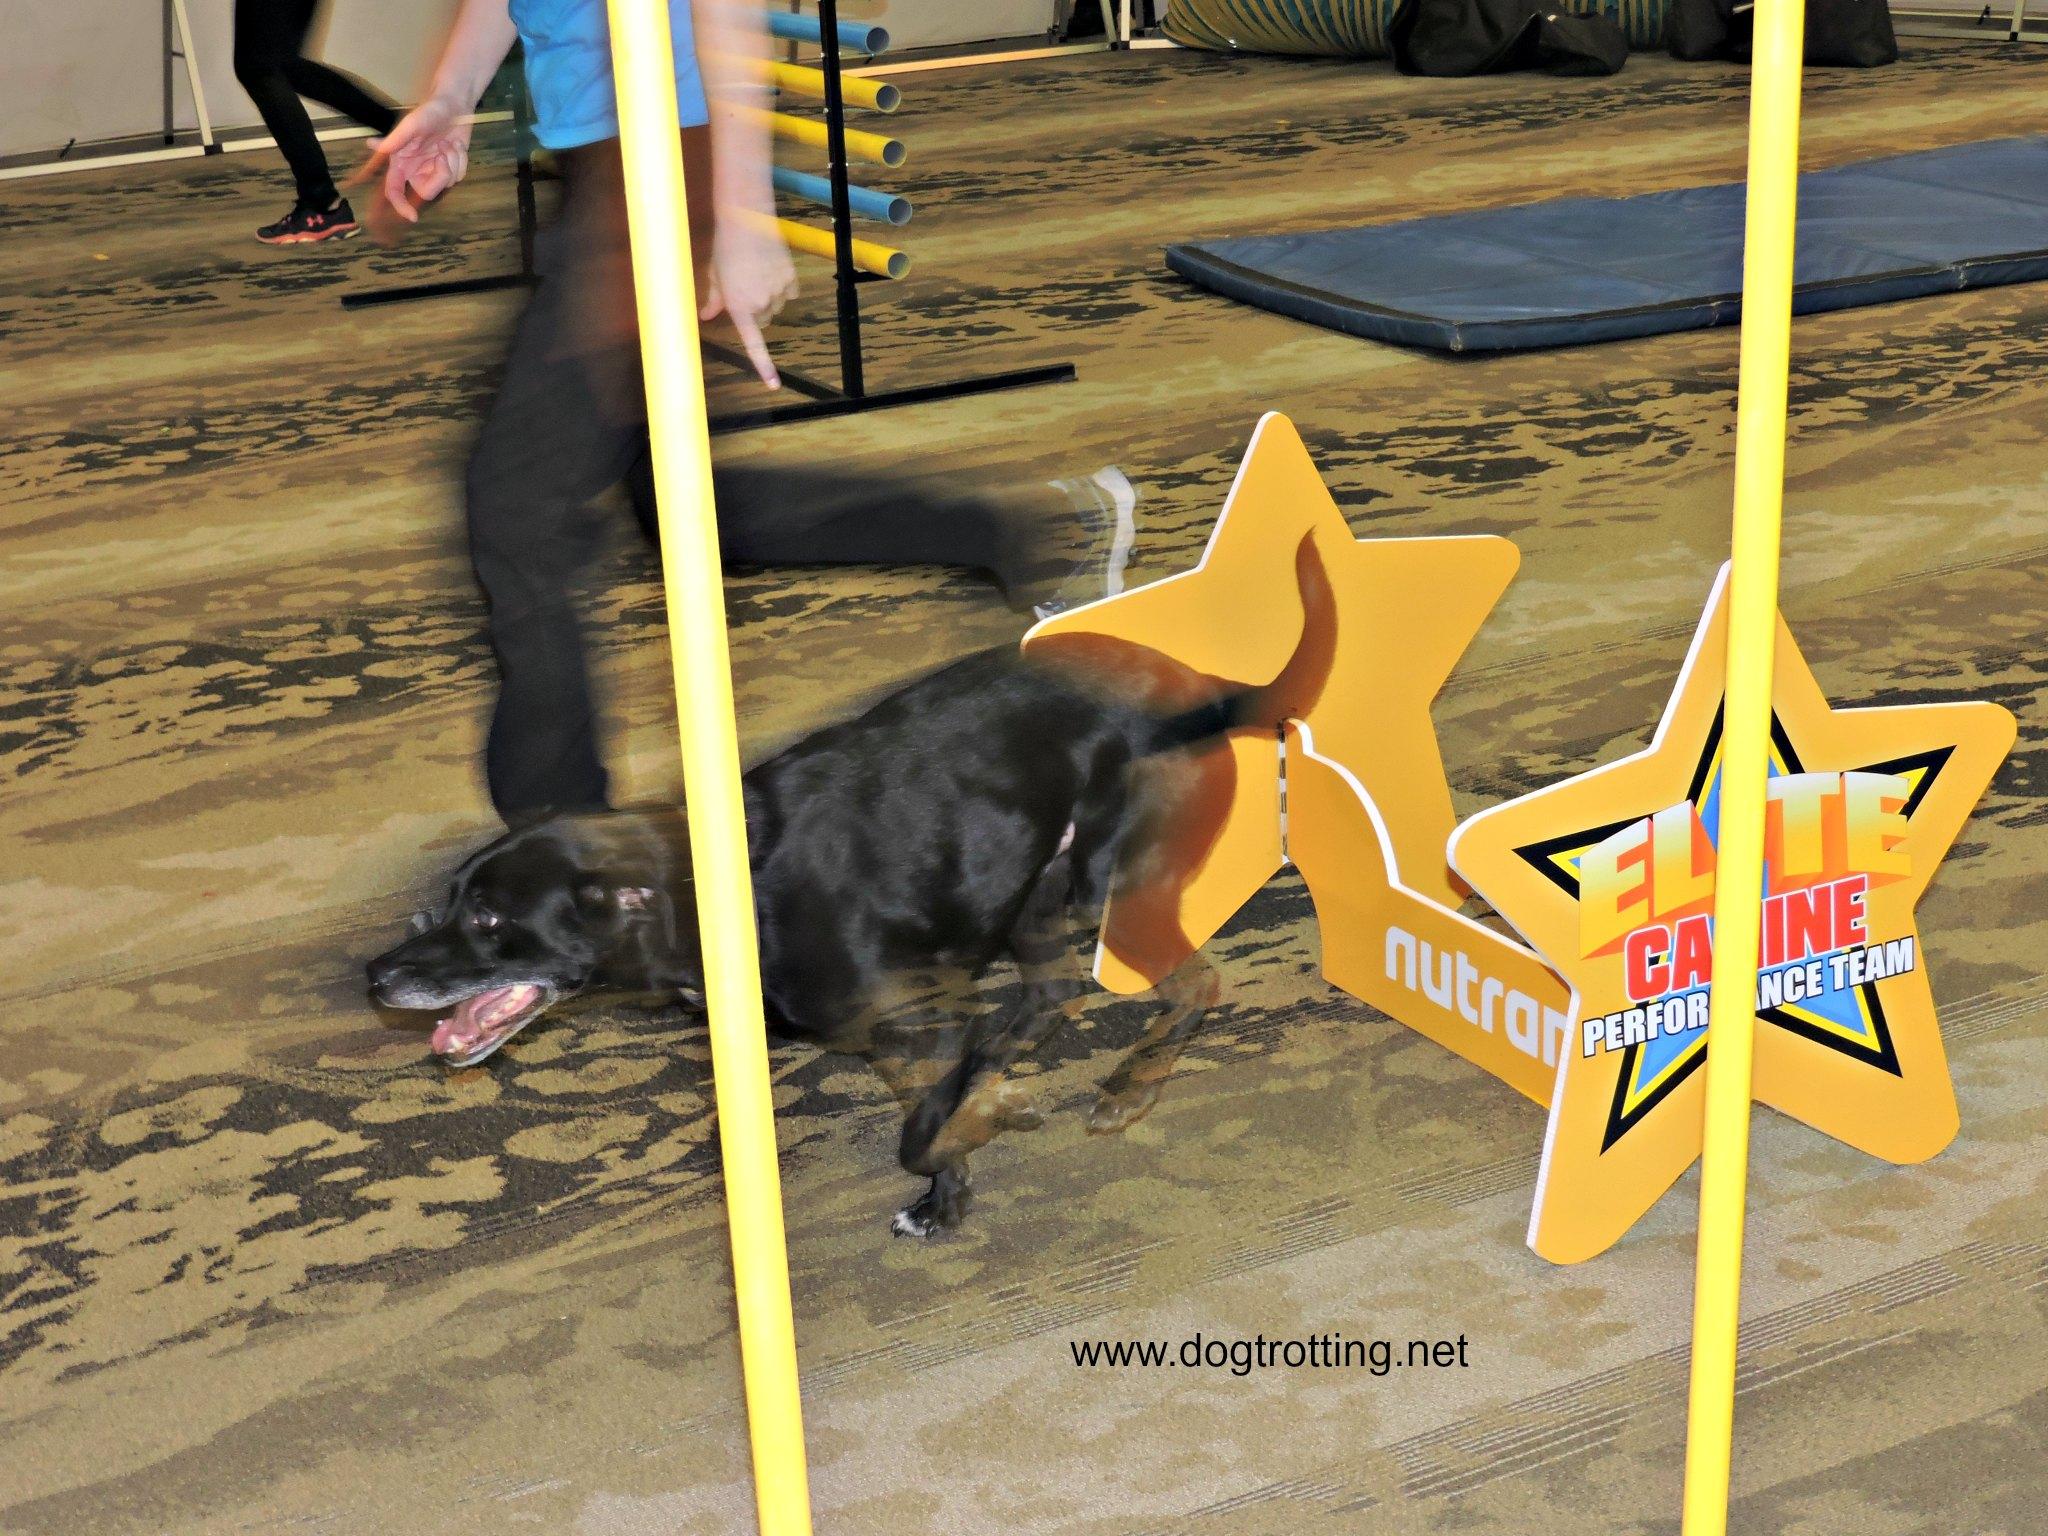 Elite Canine Performance Team dog jumping